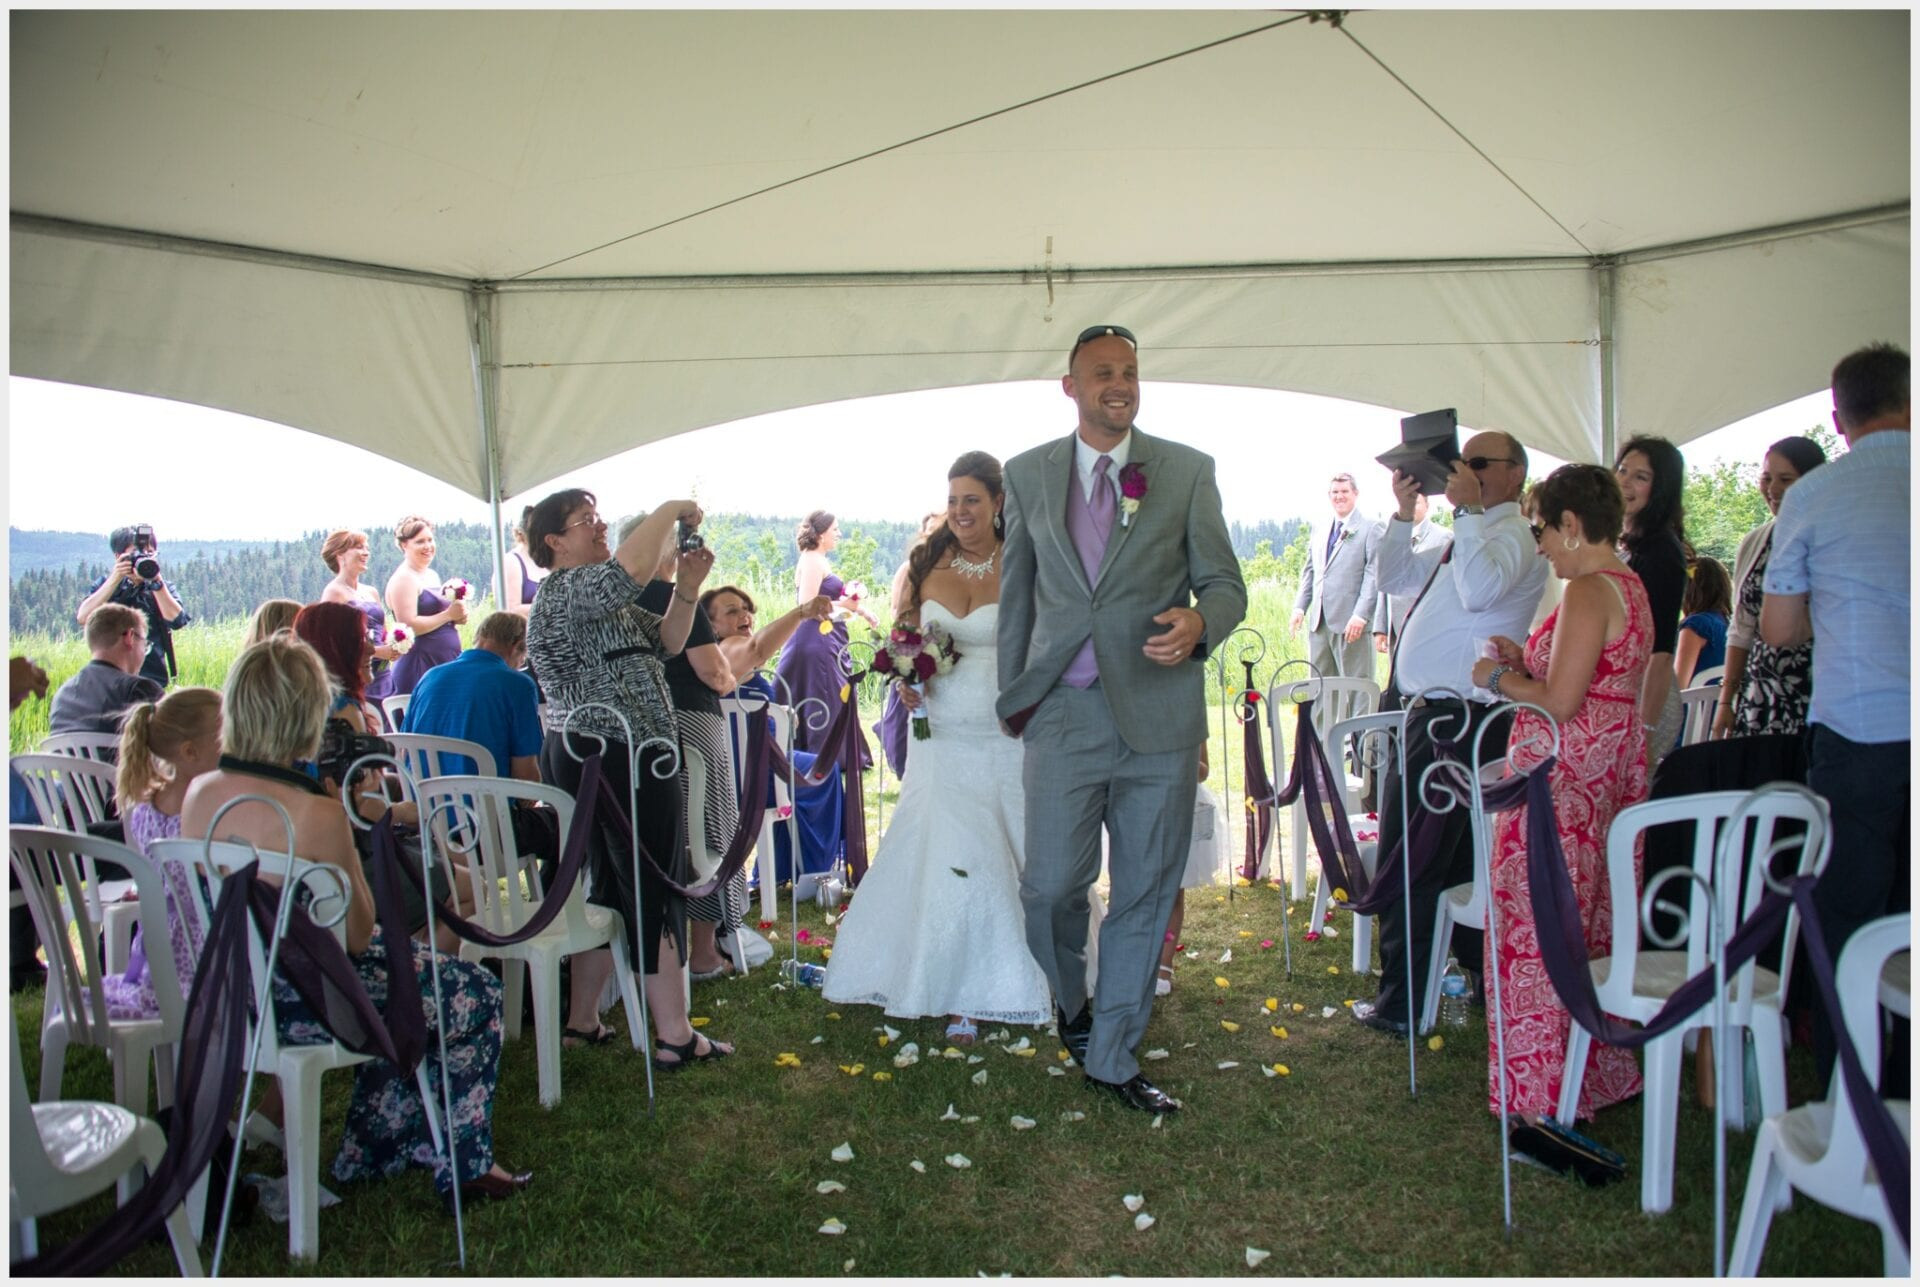 005-Calgary-Priddis Greens wedding-walk-down-the aisle_Photography-